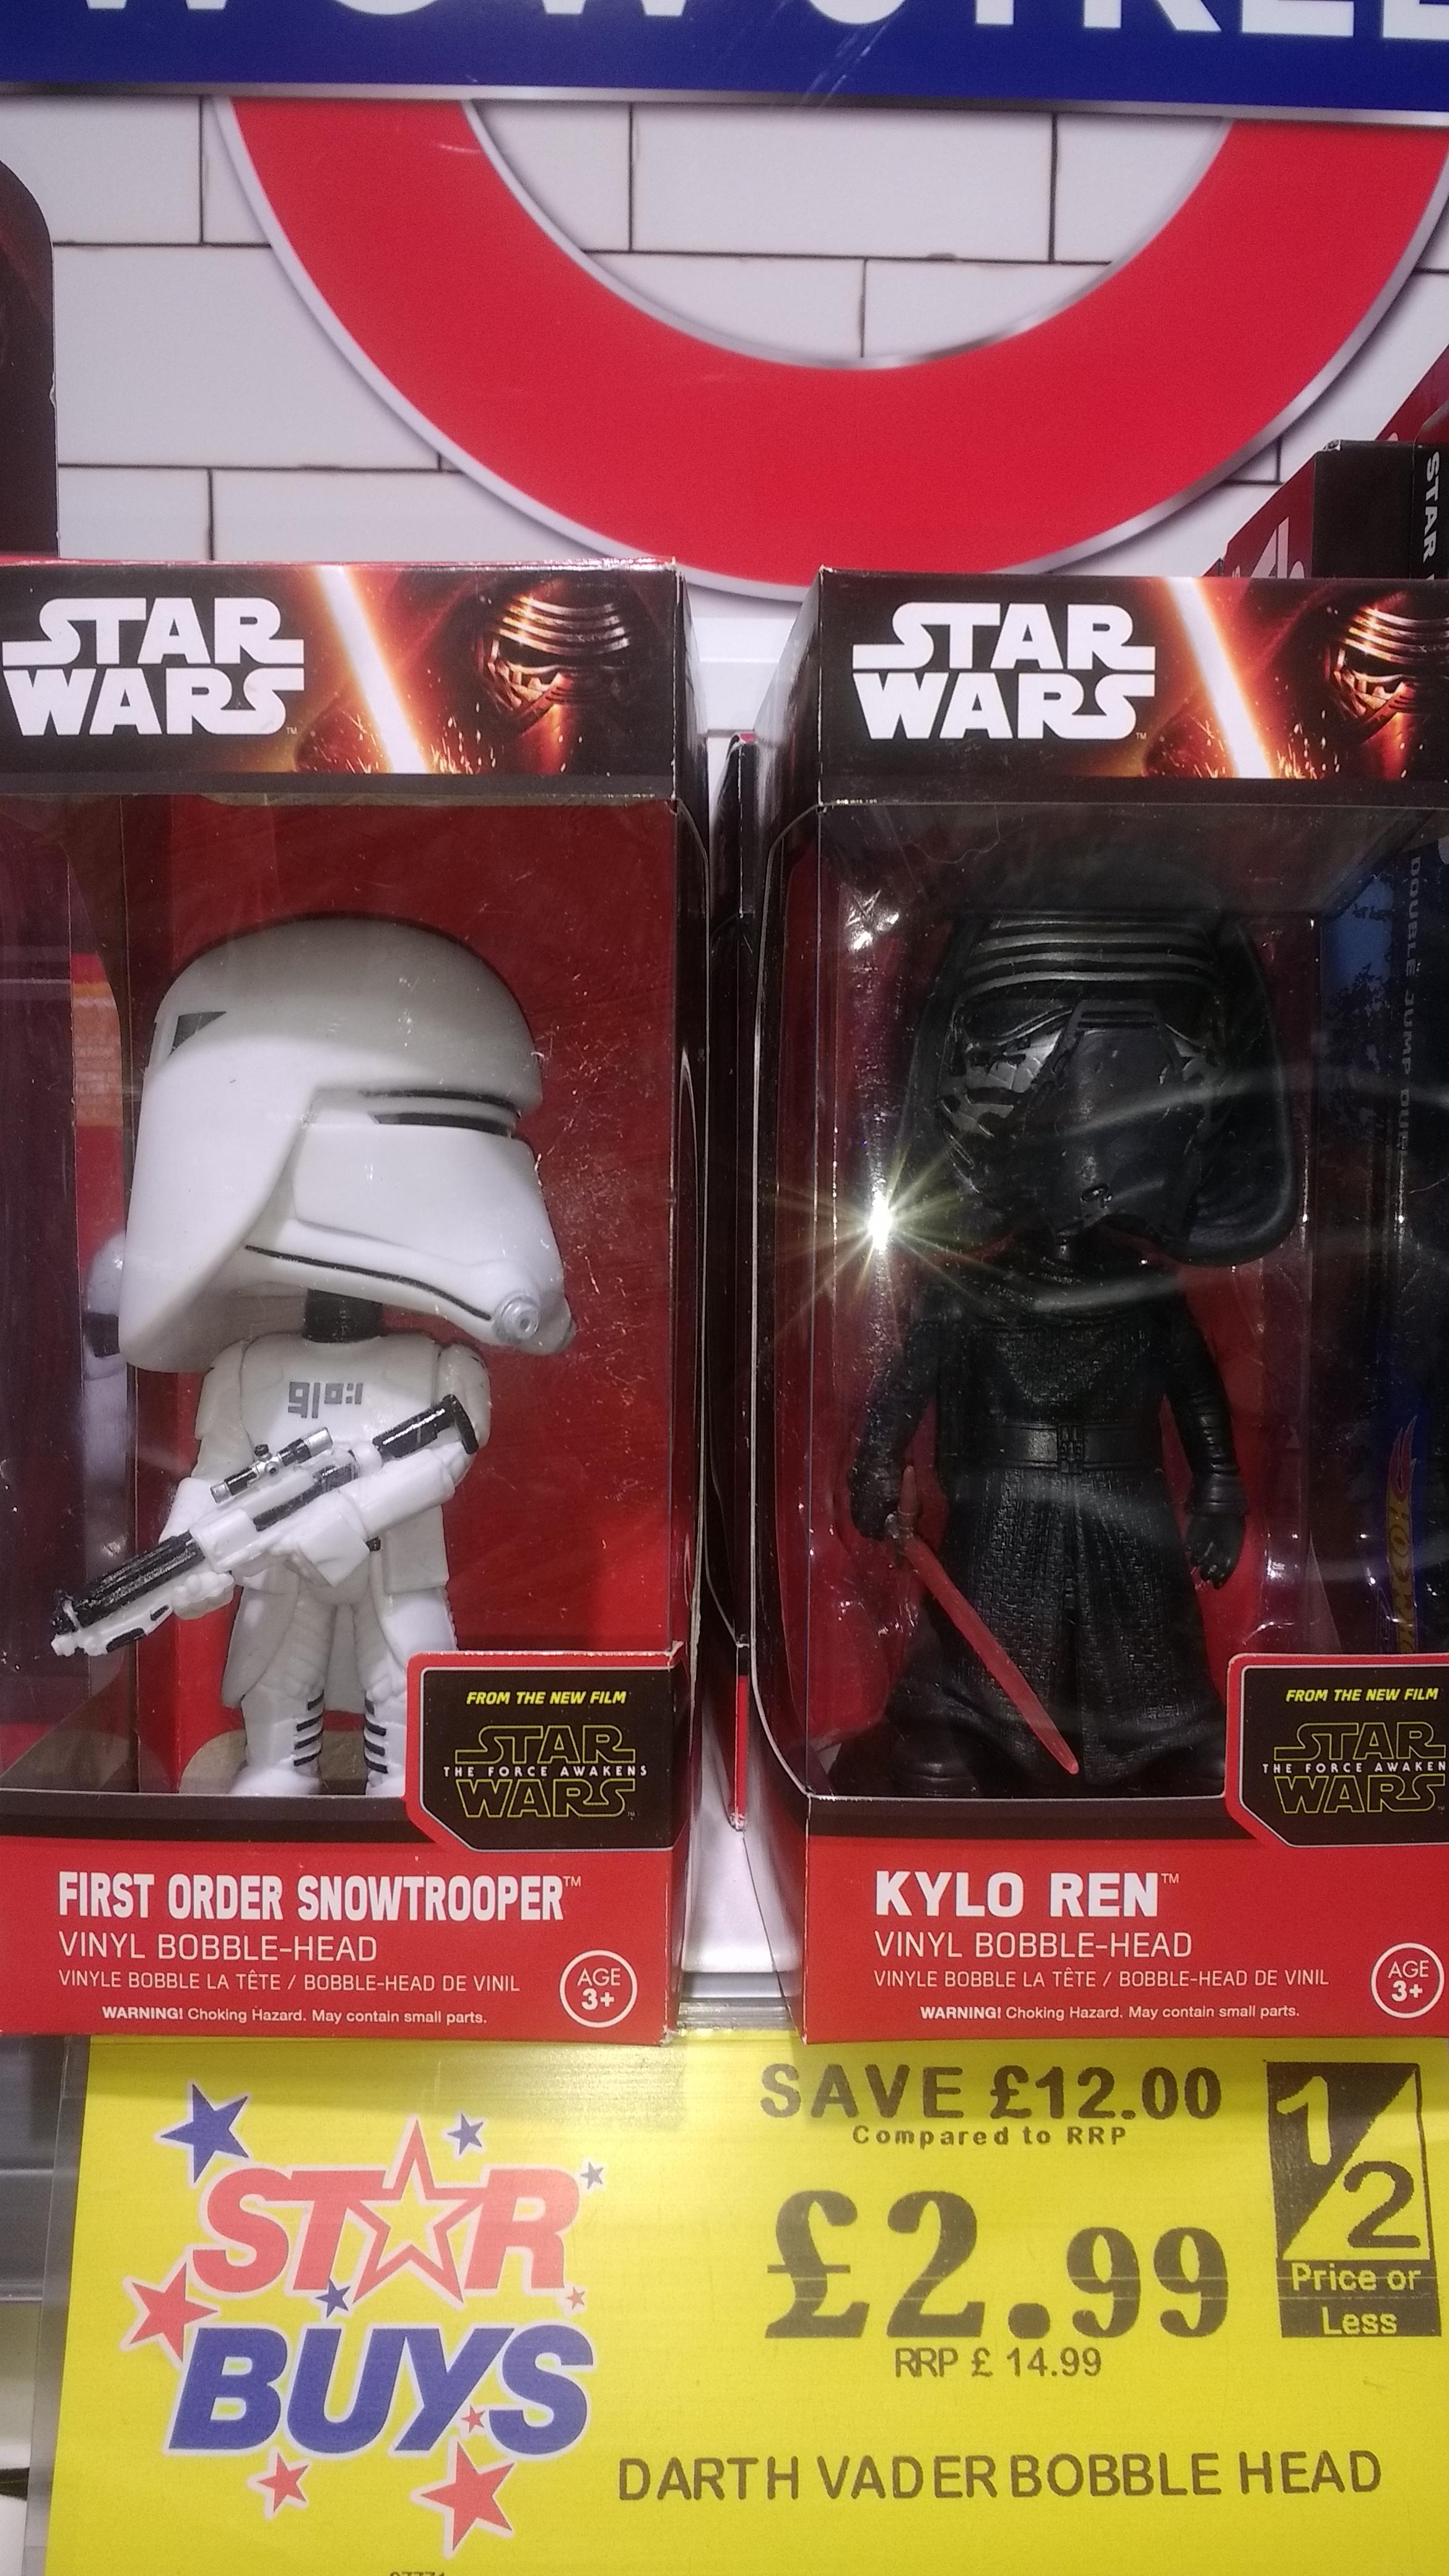 Star Wars Darth Vader Bobble Head 2.99 @ Home Bargains